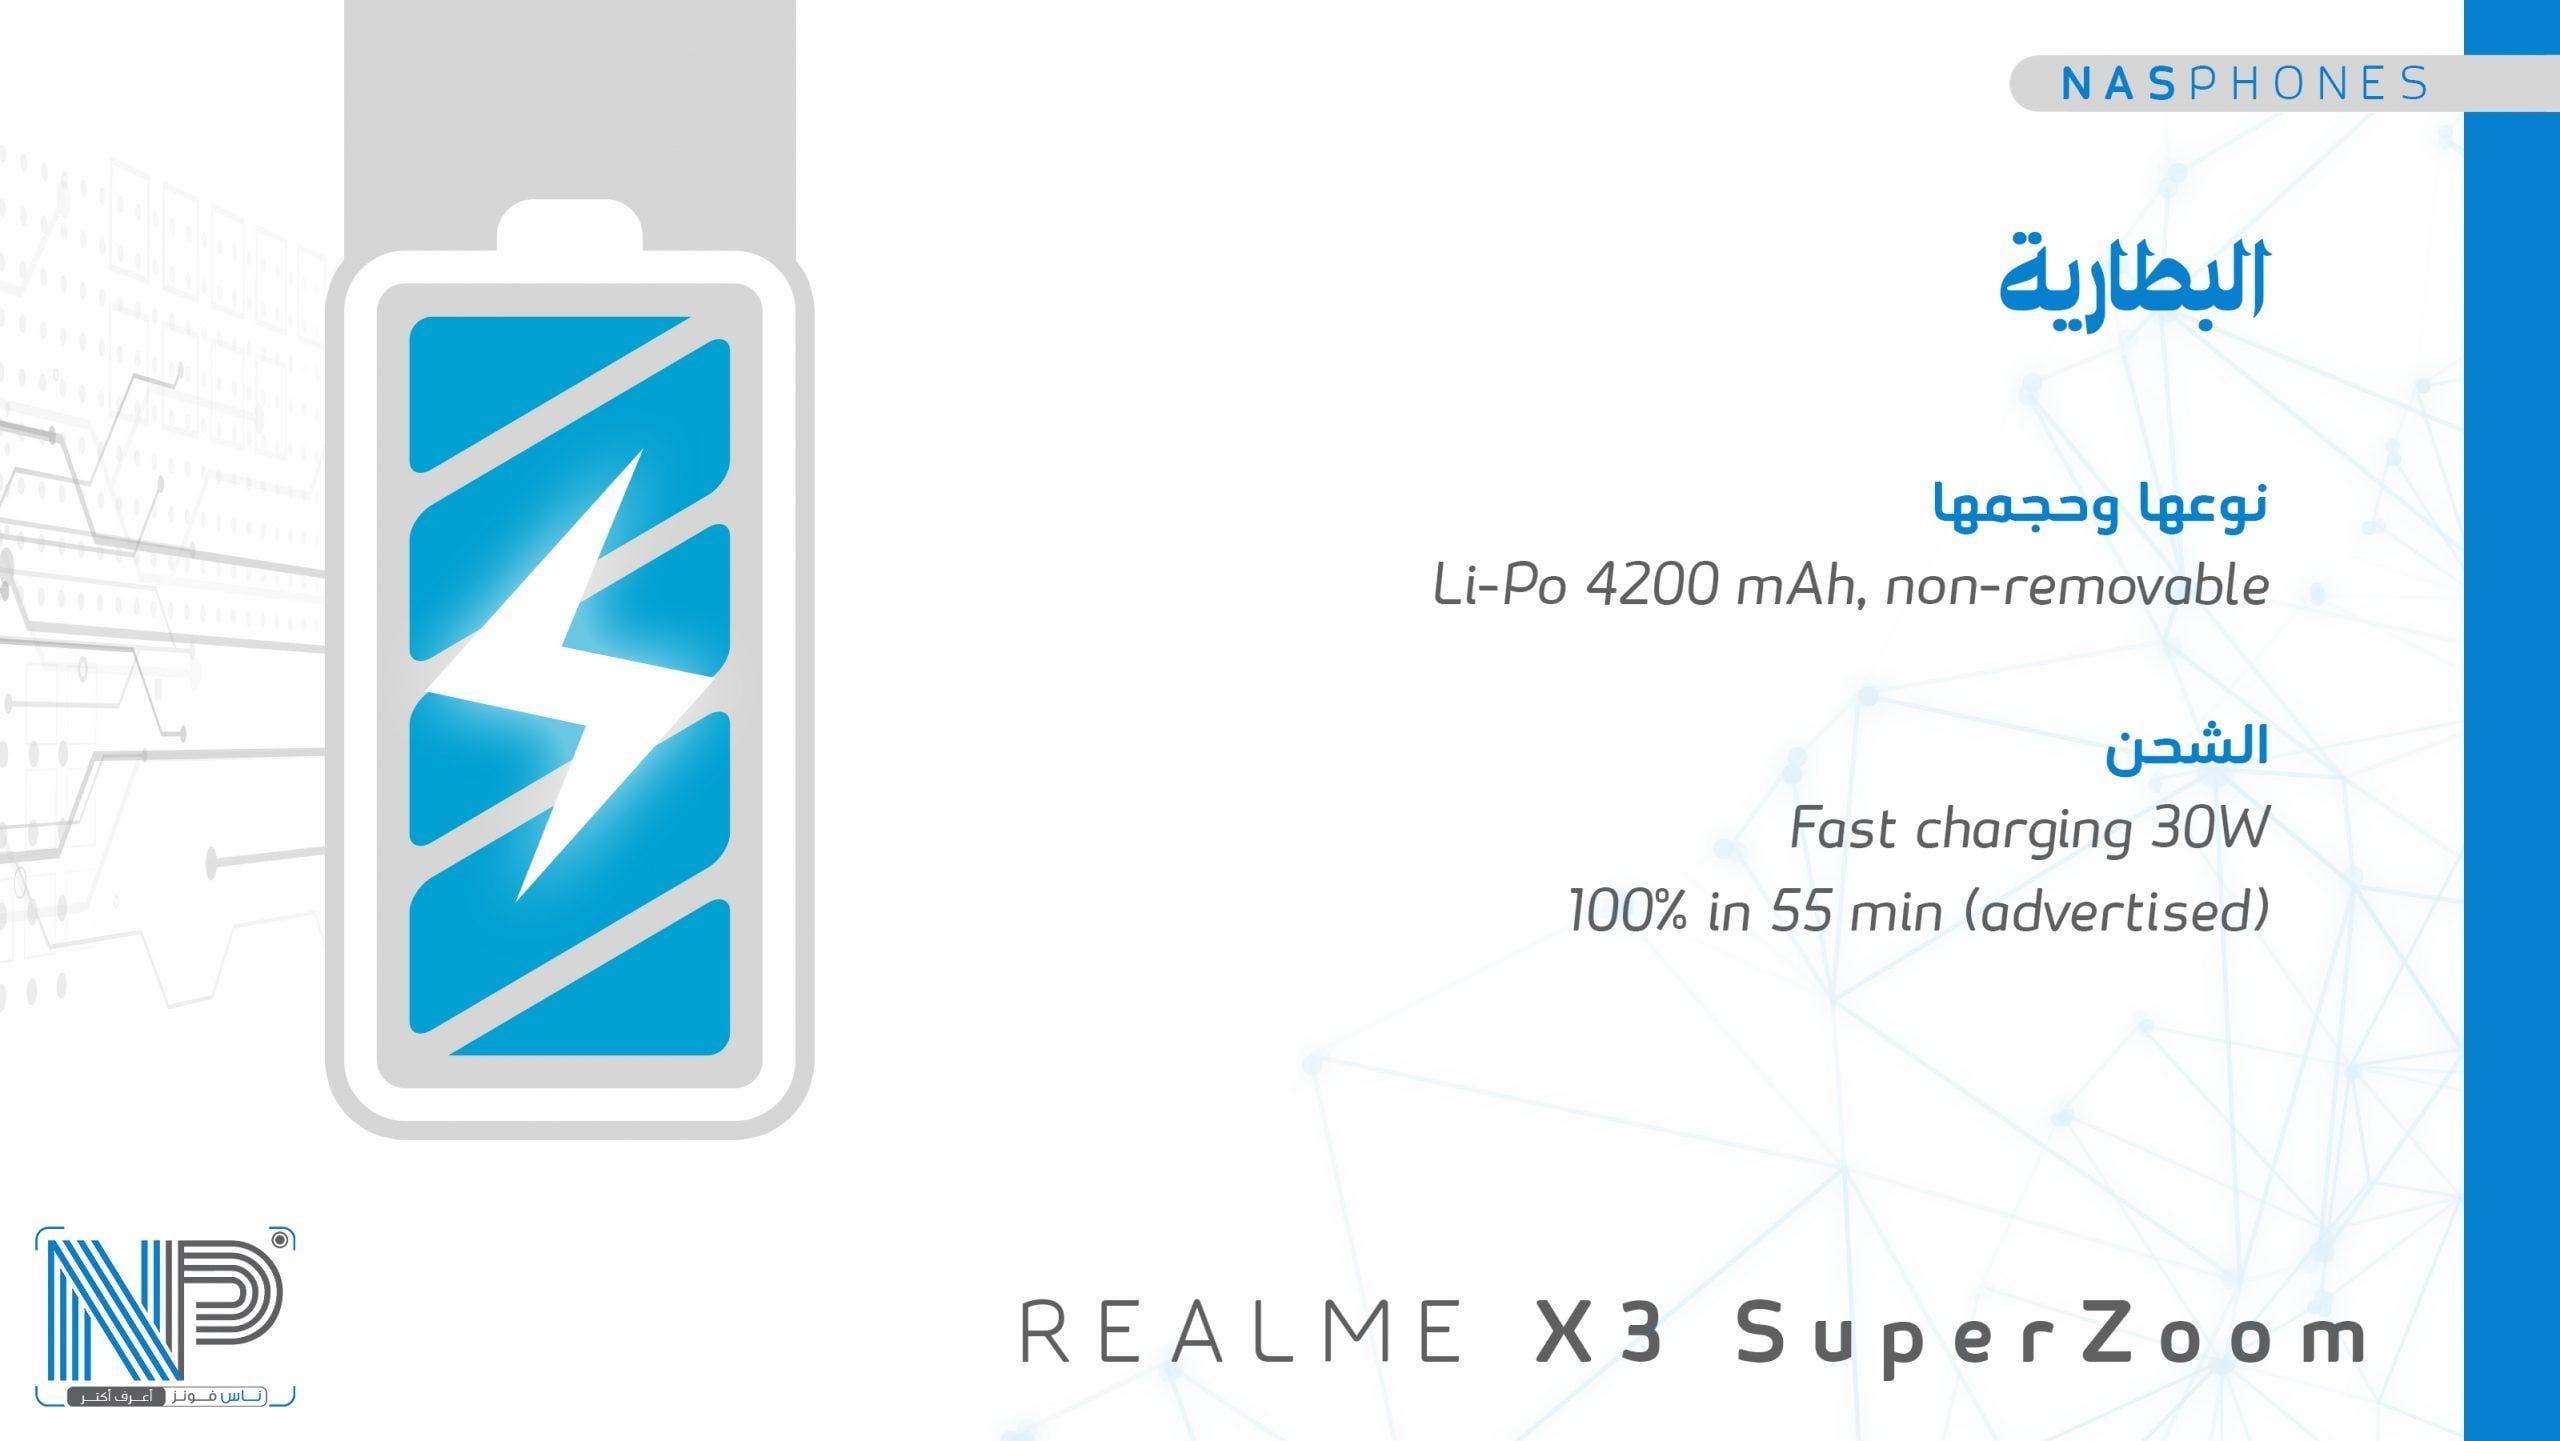 بطارية موبايل Raelme x3 super zoom